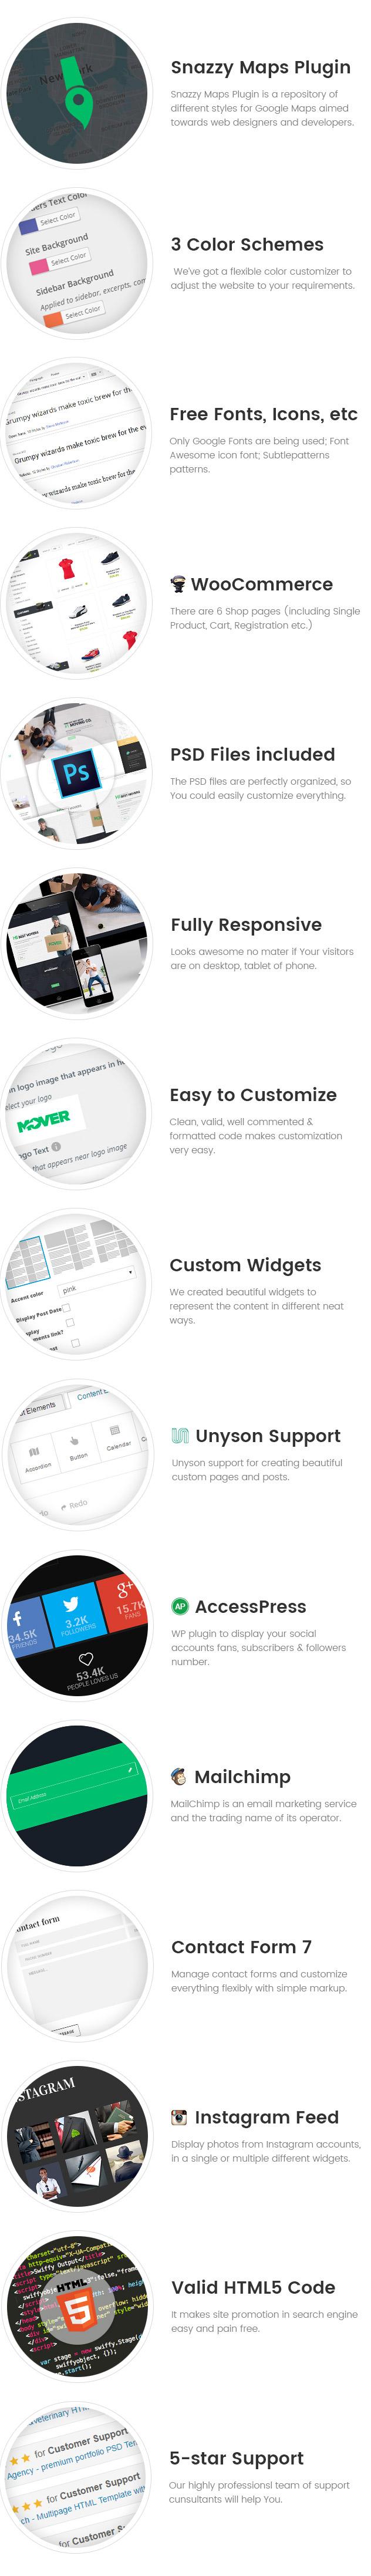 Mover - Delivery Company WordPress Theme